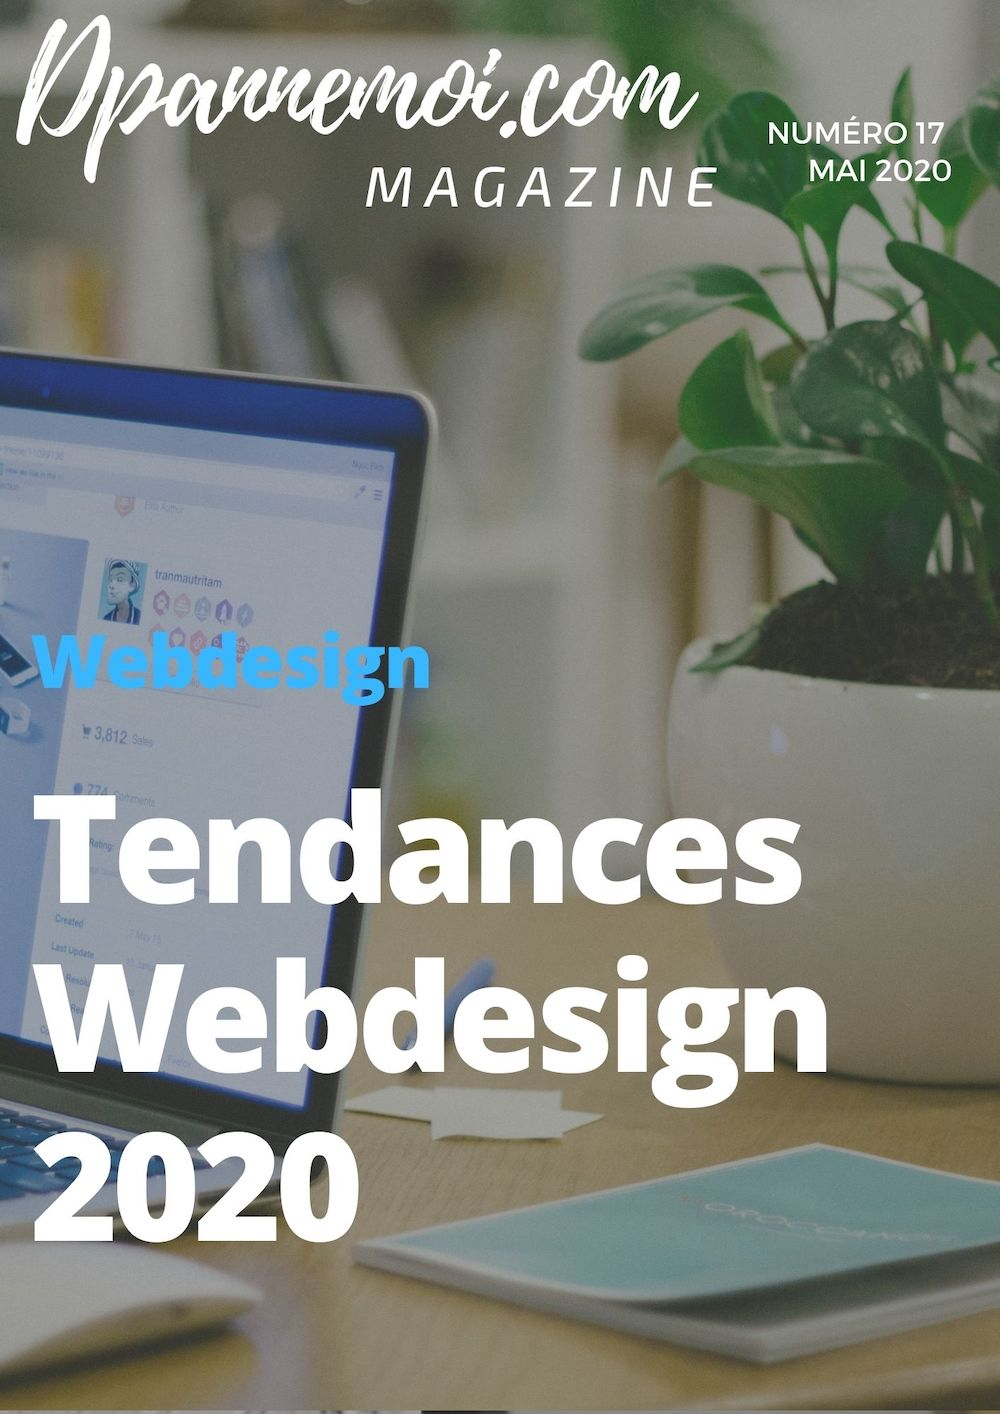 Tendances webdesign 2020